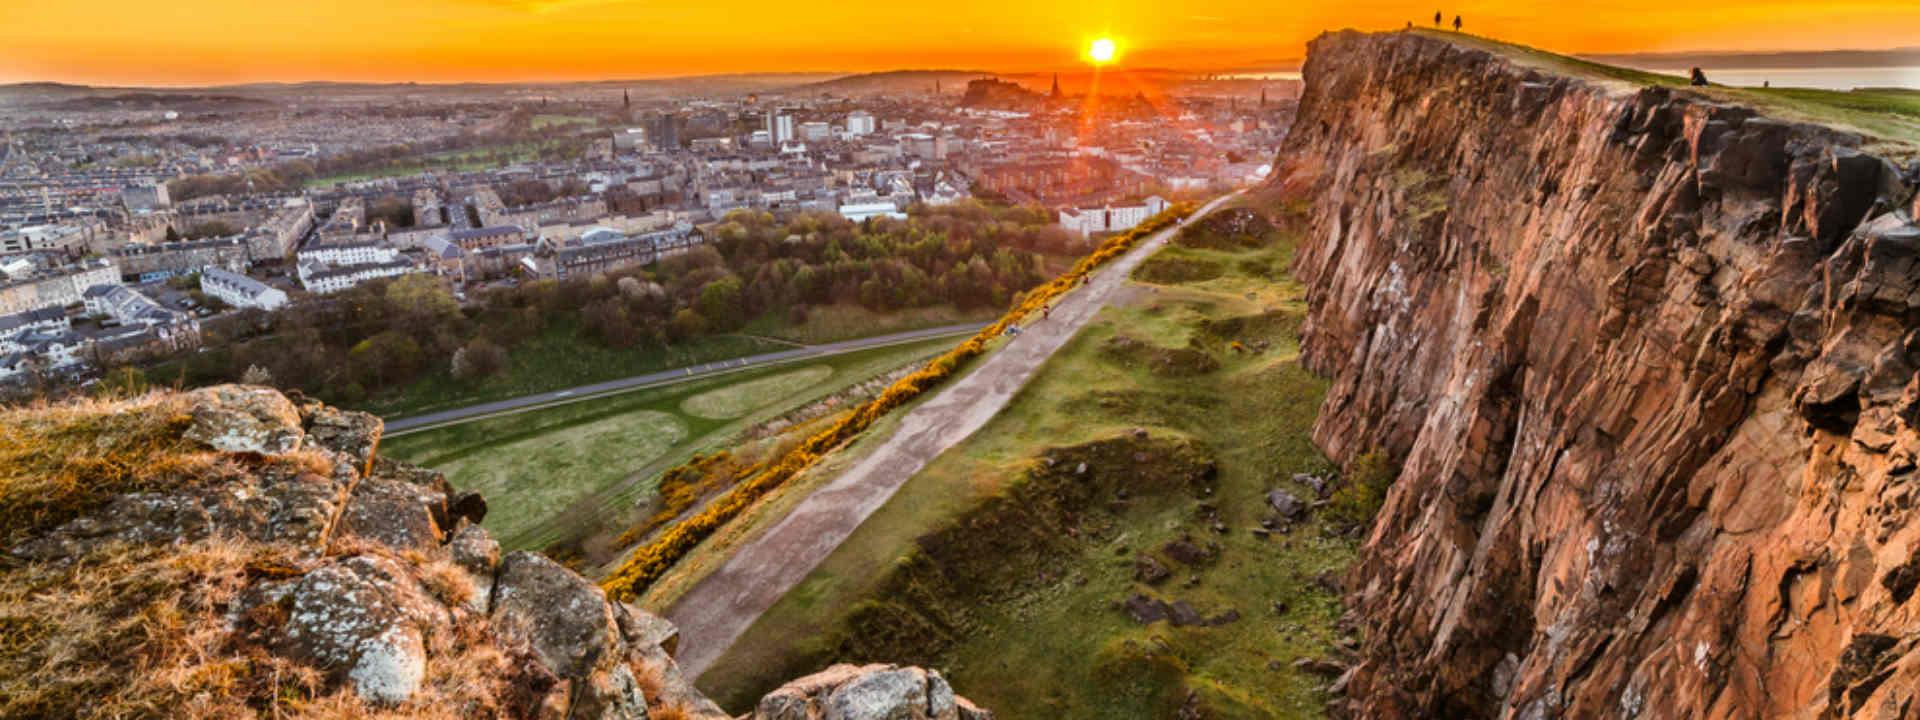 Edinburgh view from Arthurs Seat